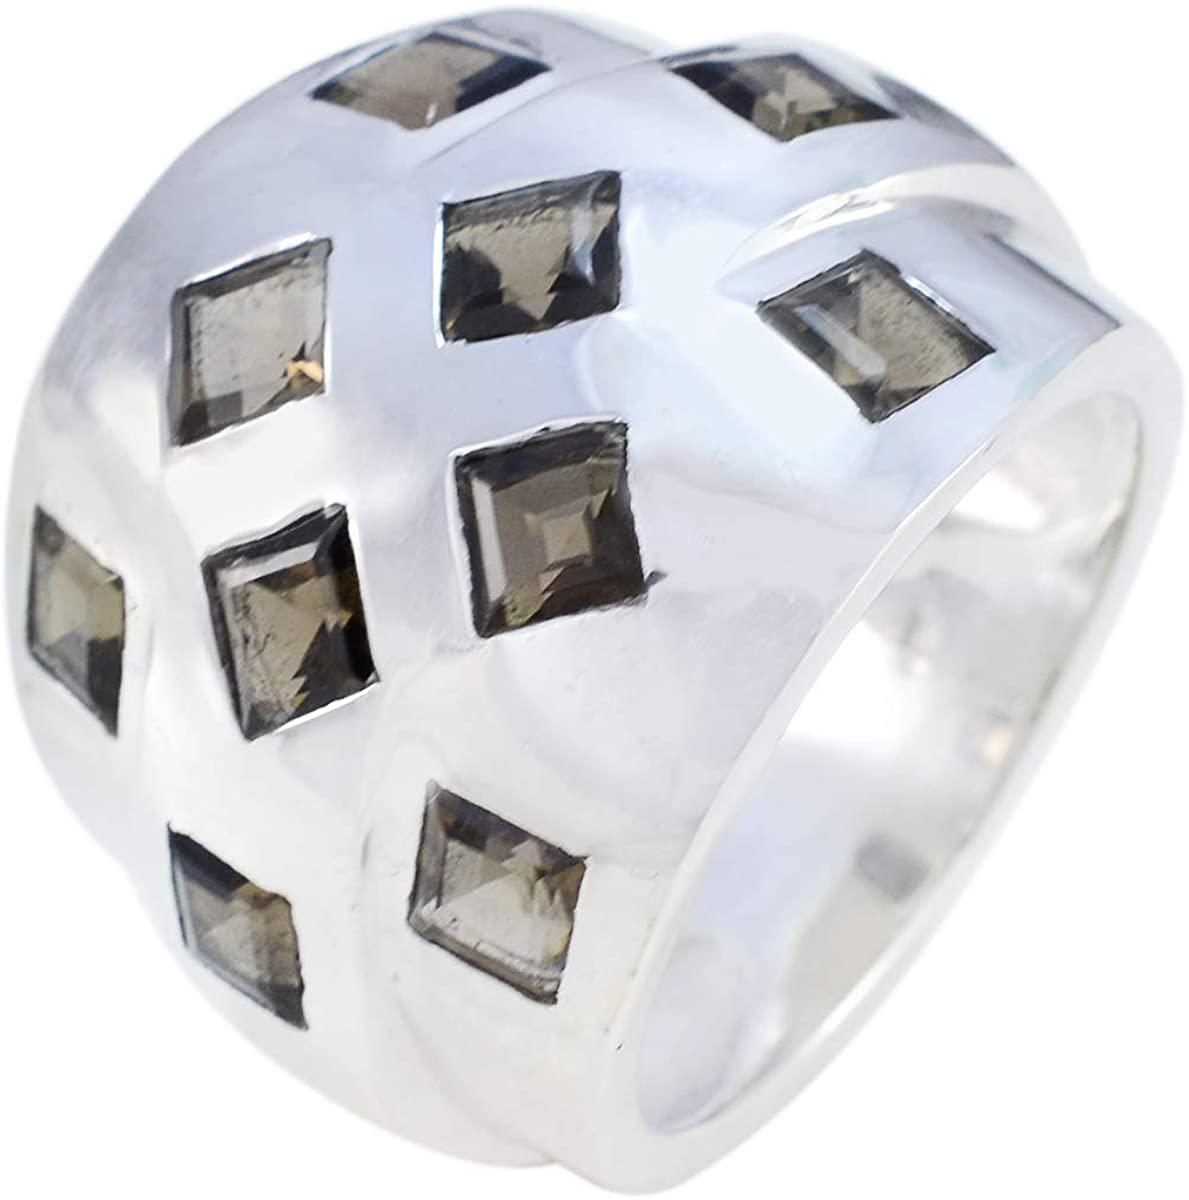 Joyas Plata Real Gemstones Square Shape Multi Stone Faceted Smoky Quartz rings-925 Sterling Silver Brown Smoky Quartz Ring-January Birth Capricorn Astrology Real Gemstones Ring SRSQUFC-7209-4 us